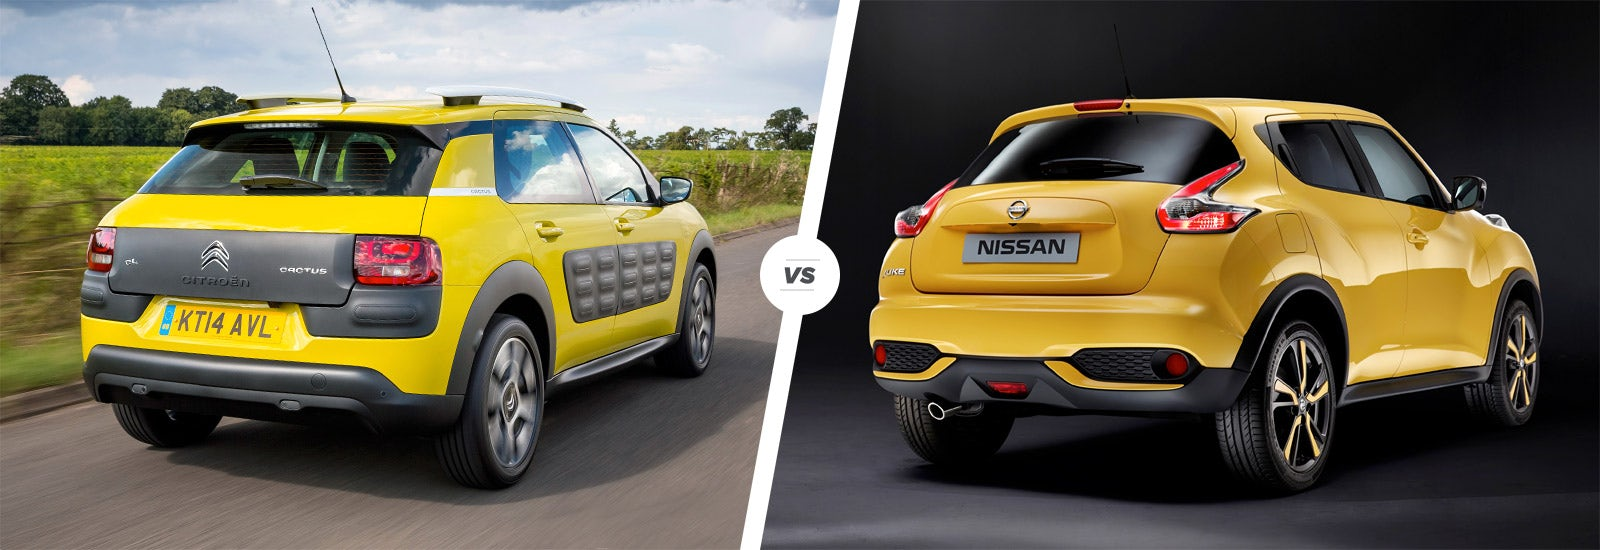 citroen c4 cactus vs nissan juke: crossover clash   carwow